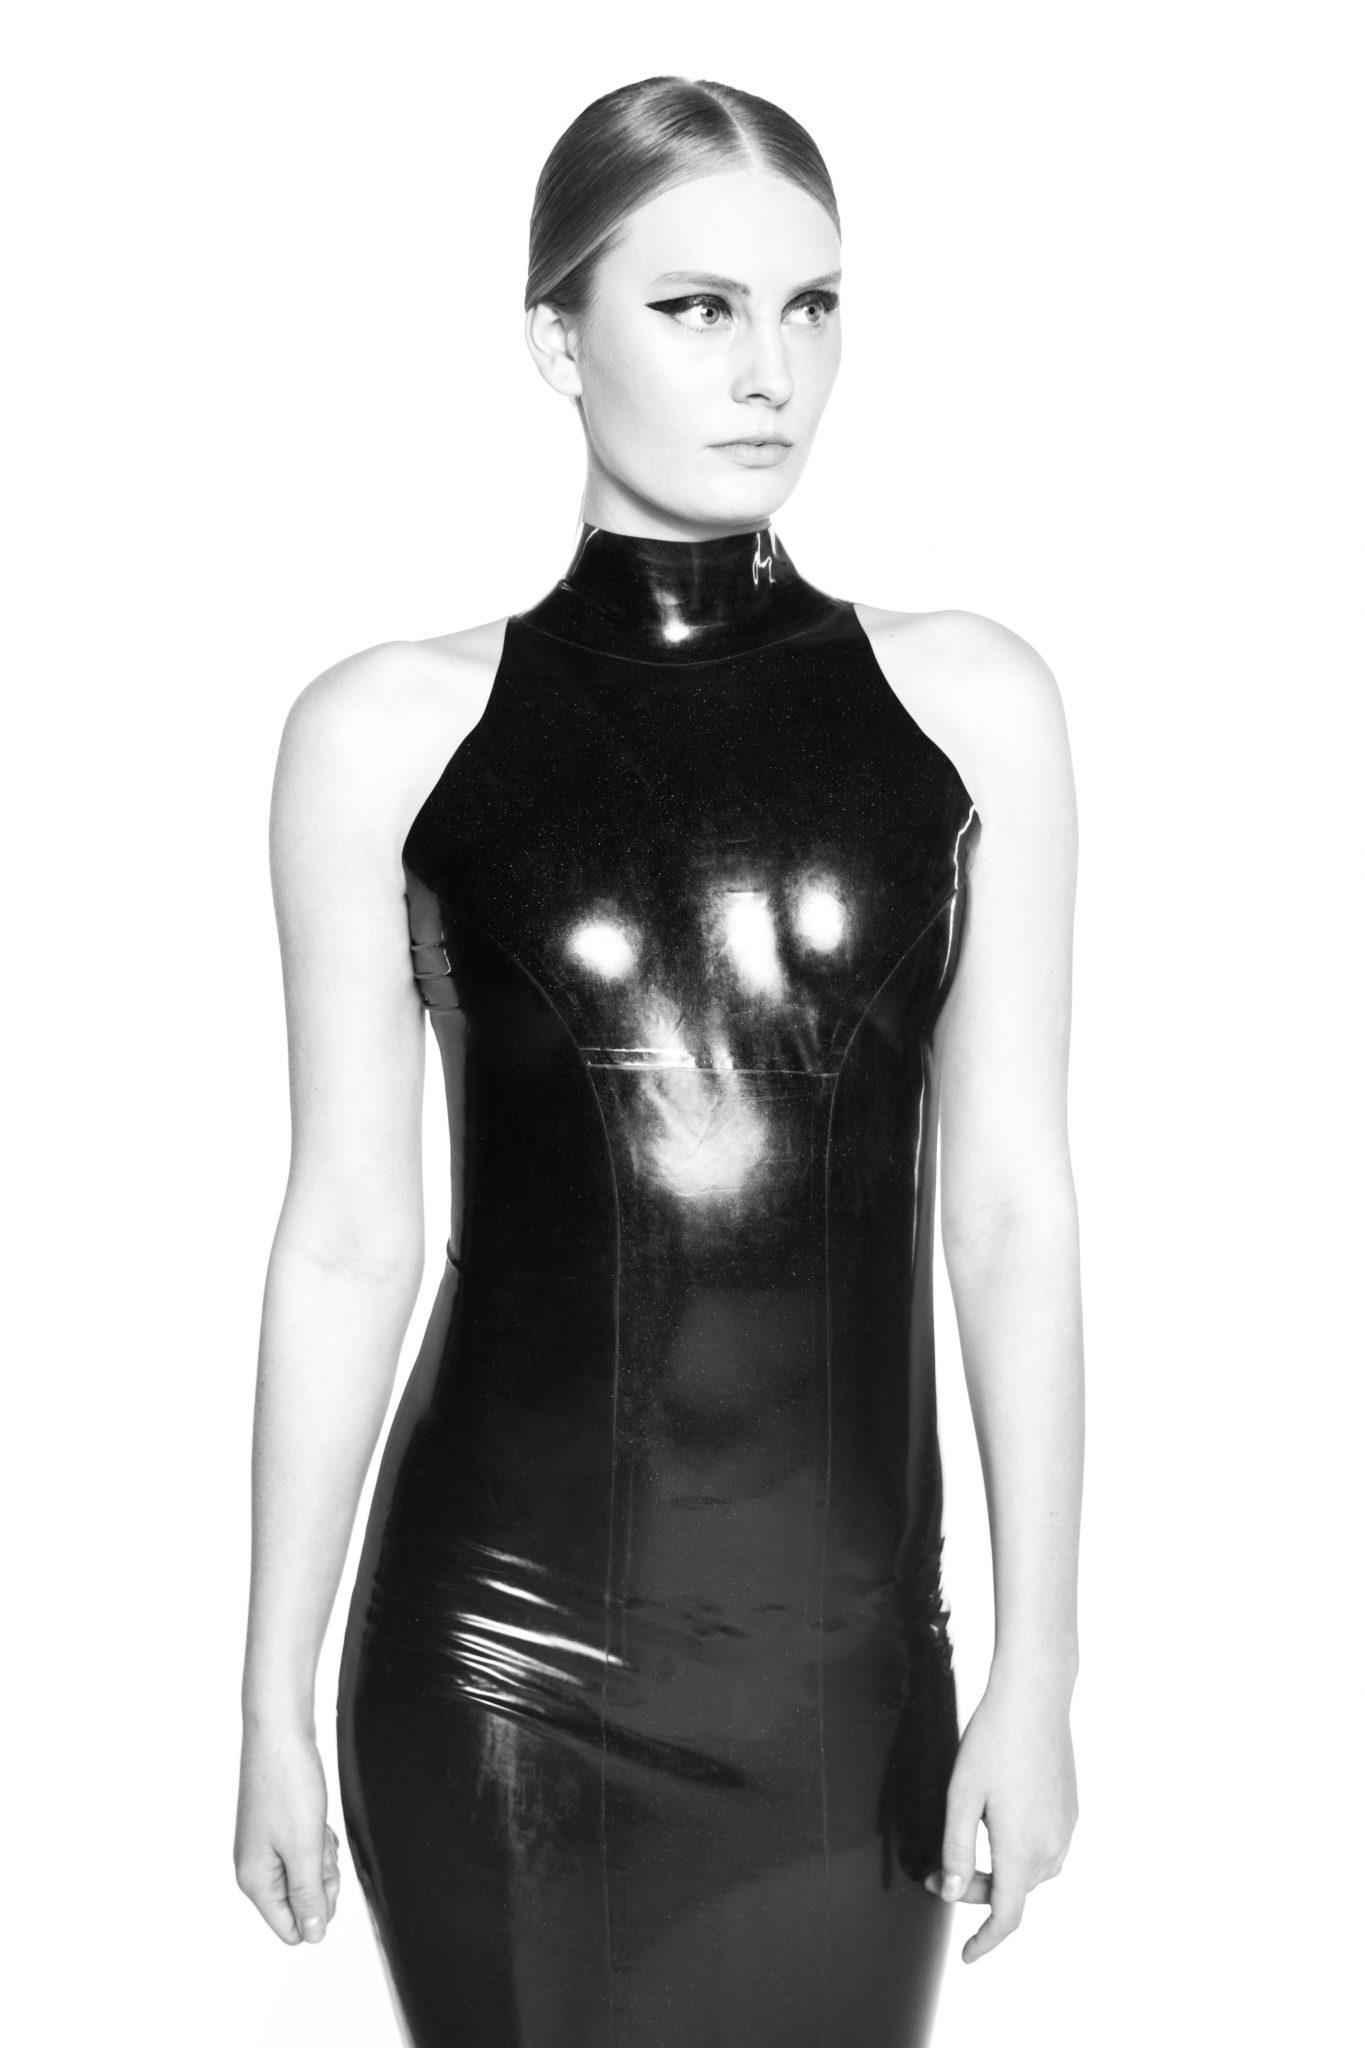 Seattle Fashion Week Photo Shoot By David M. Bailey Featuring Dawnamatrix Couture